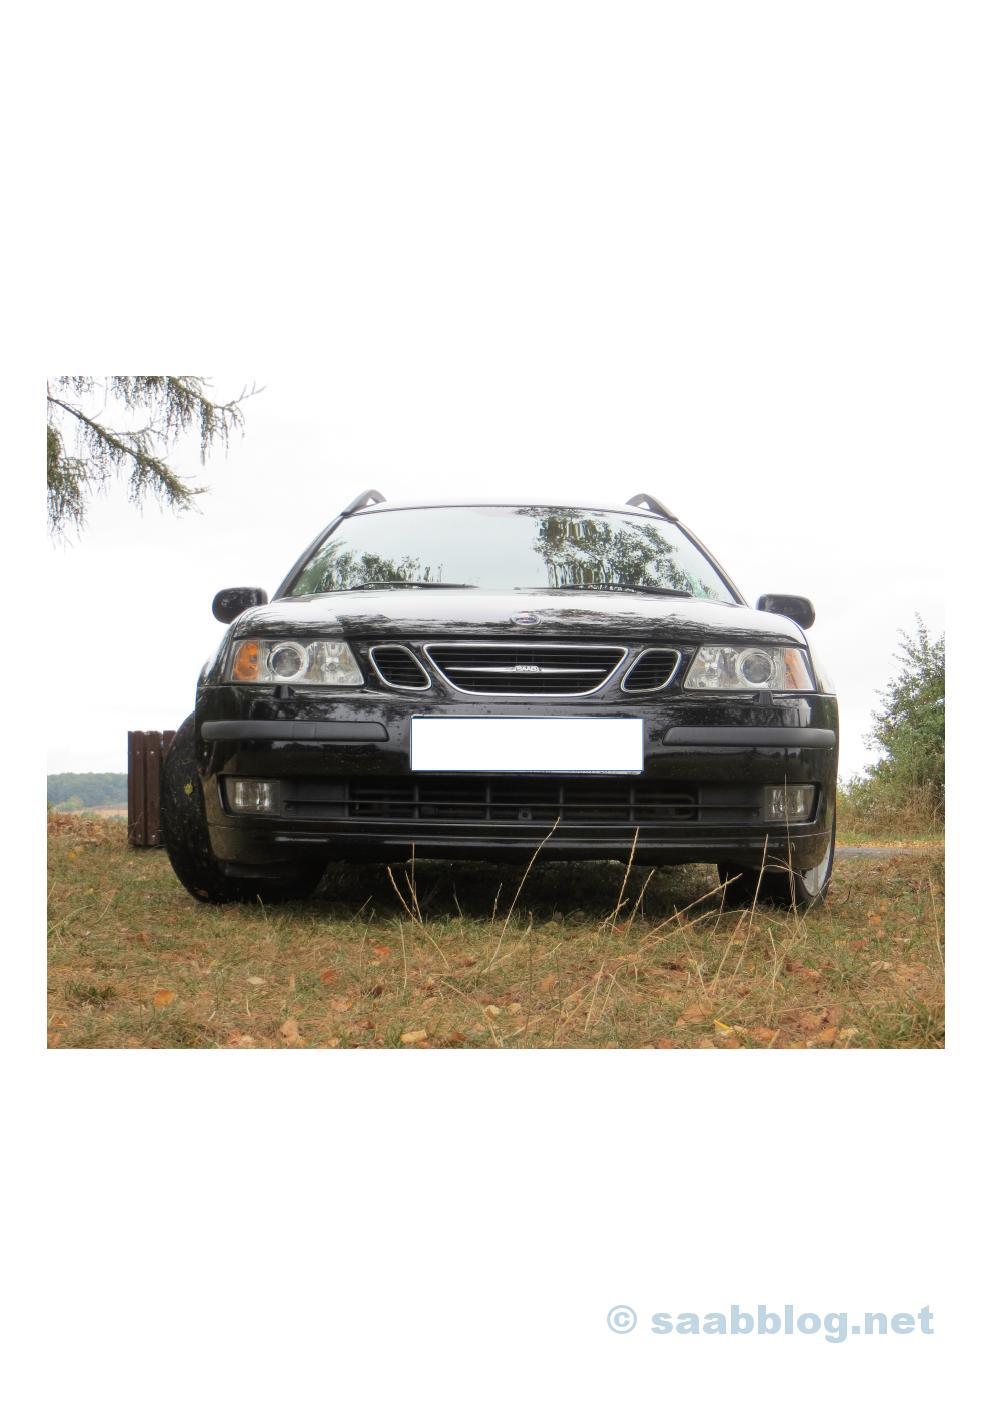 Saab 9-3 attend ... 100 jours restants!